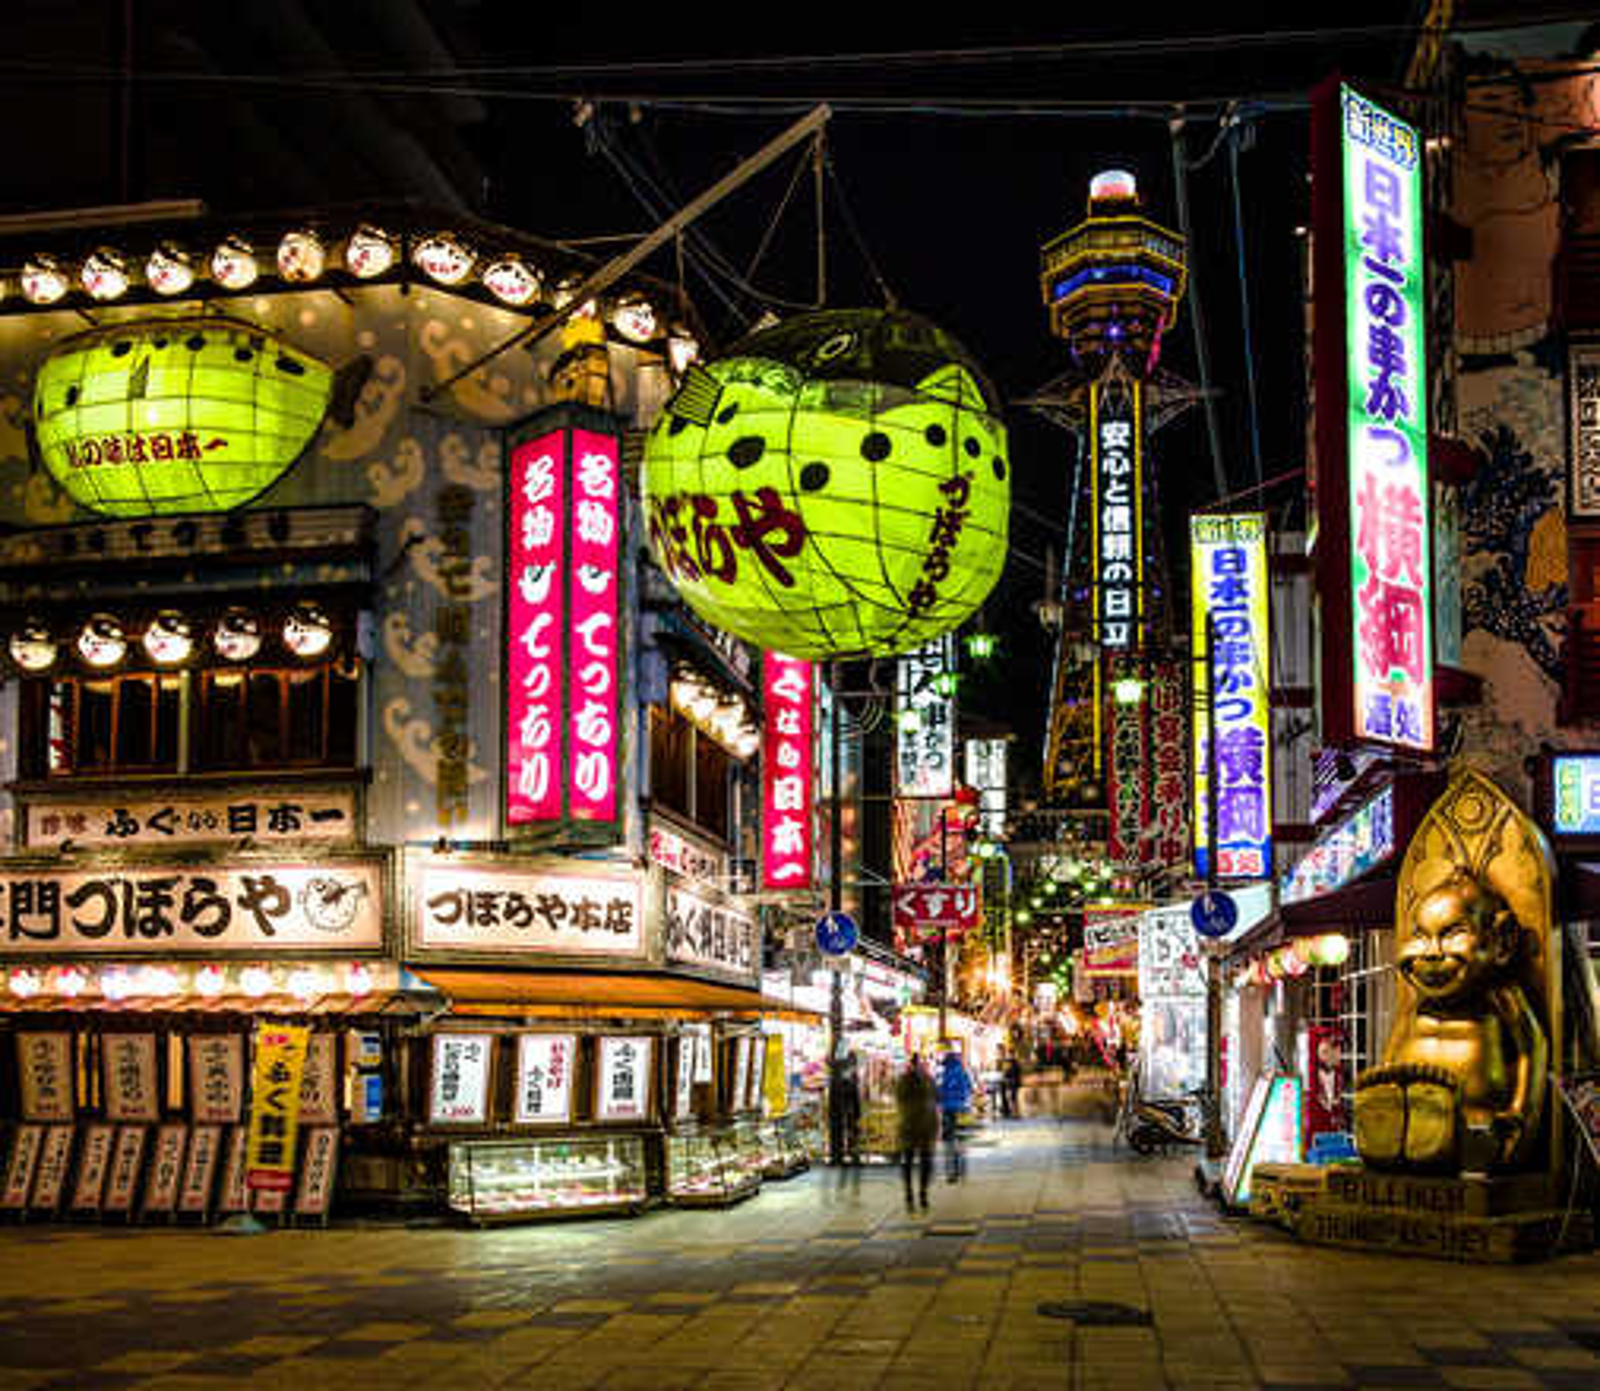 Shinsekai - Farin Urlaub